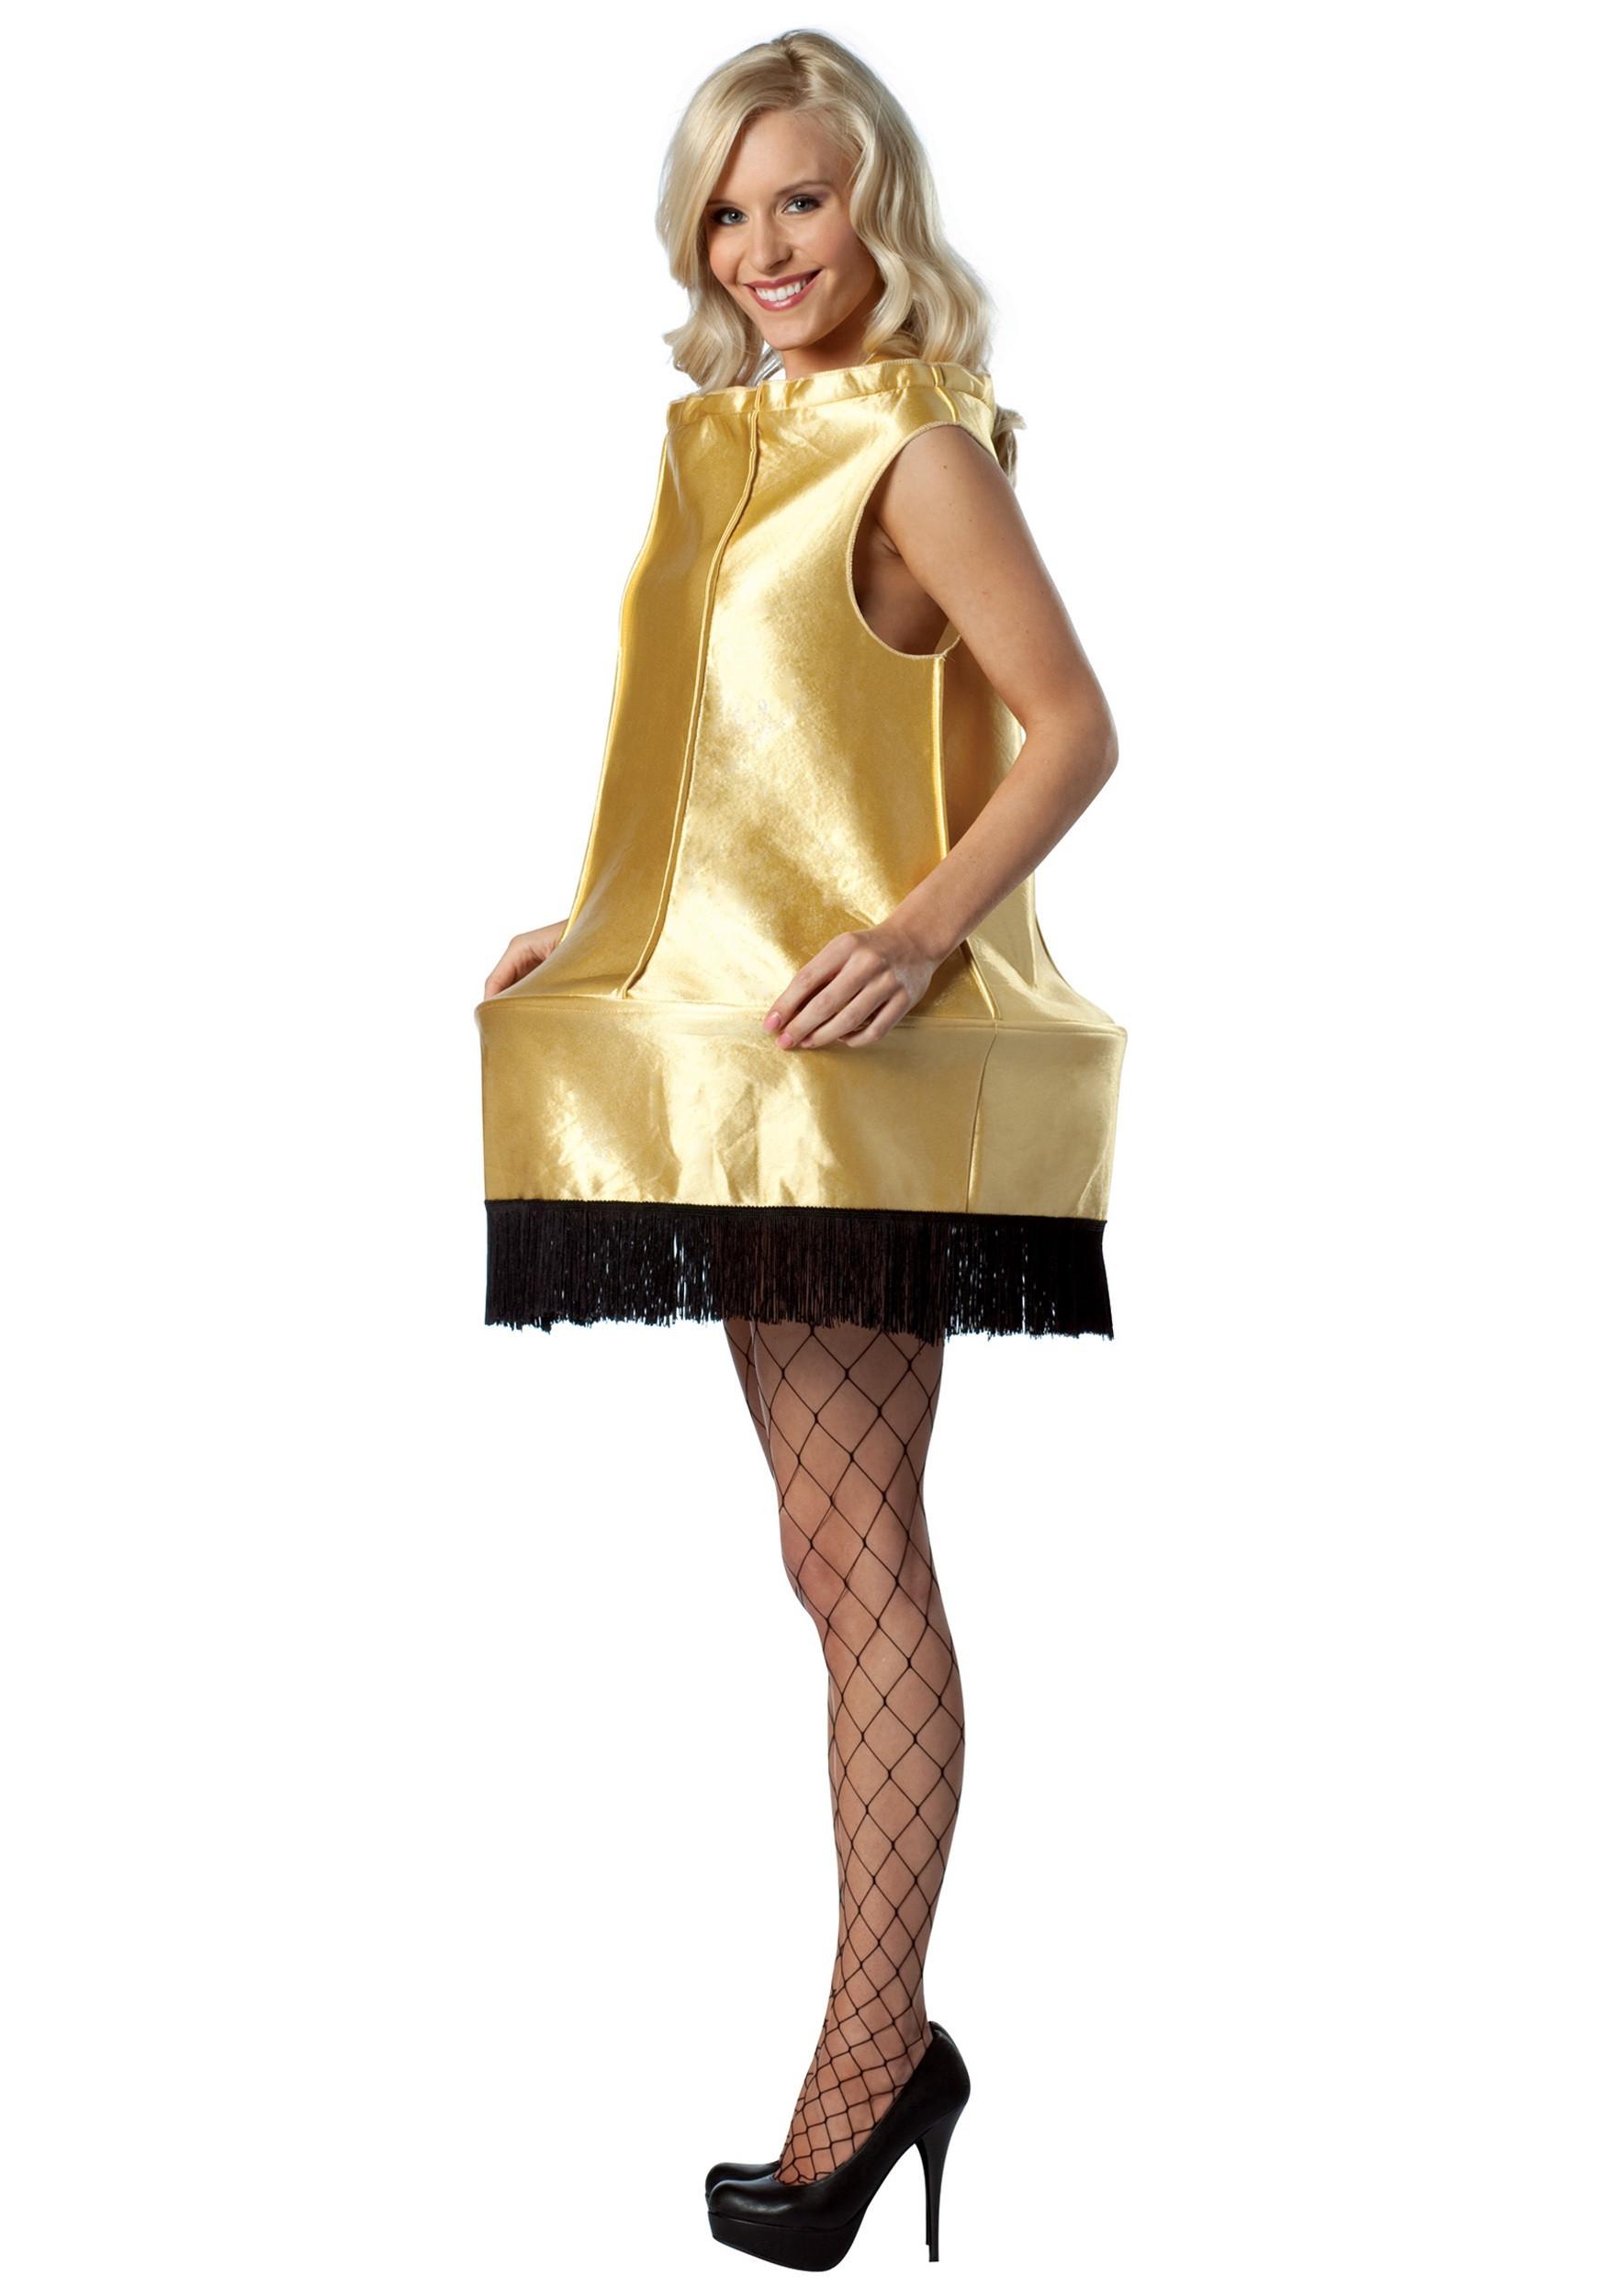 Leg Lamp Halloween Costume  A Christmas Story Leg Lamp Costume